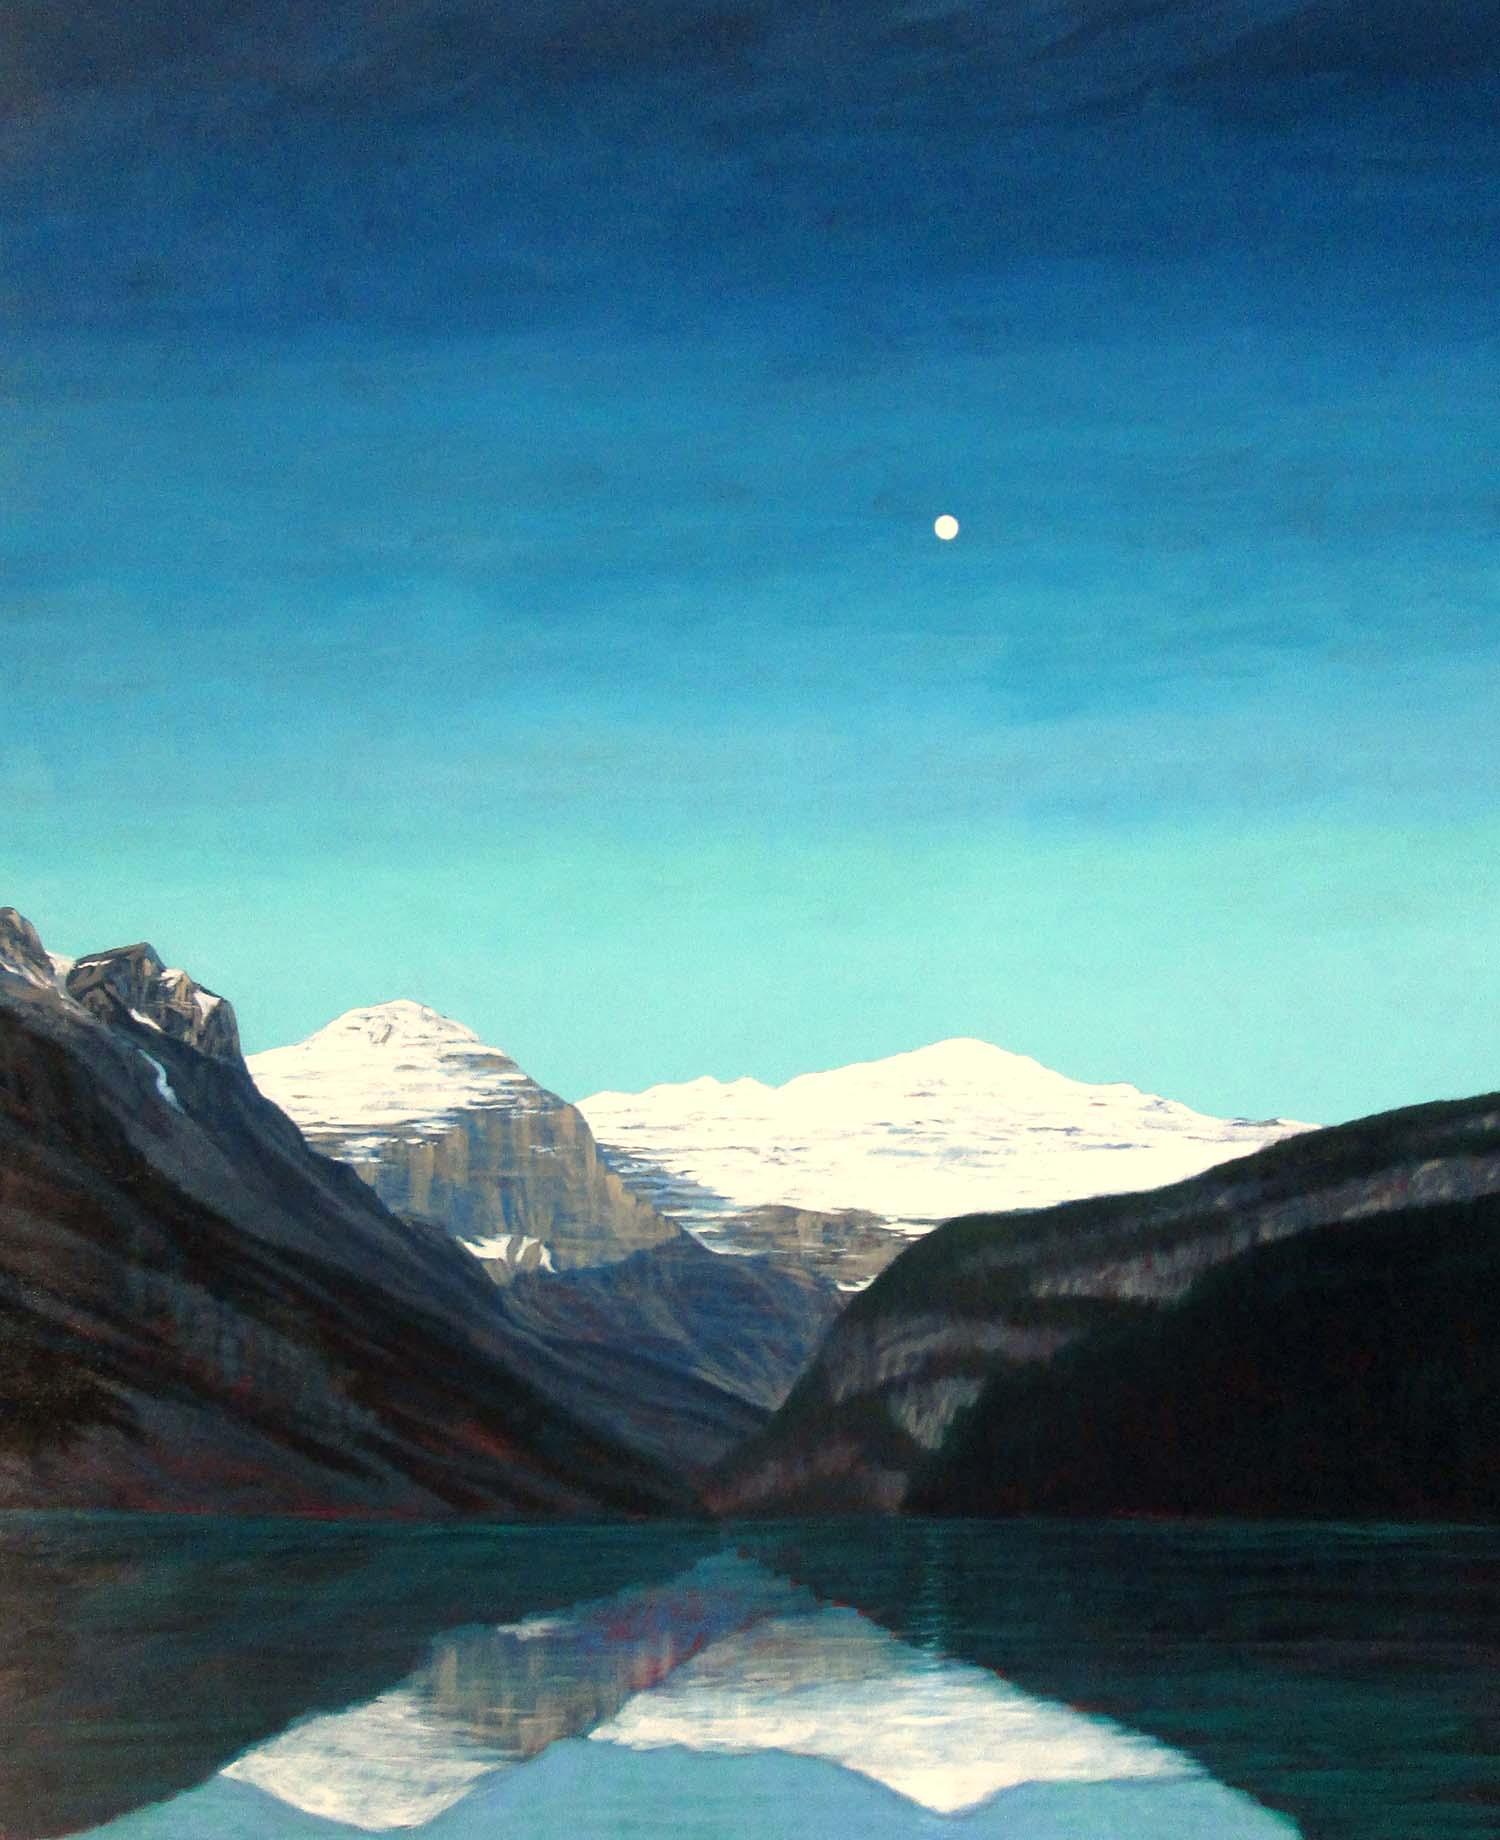 Lake Louise Moon - Chris MacClure